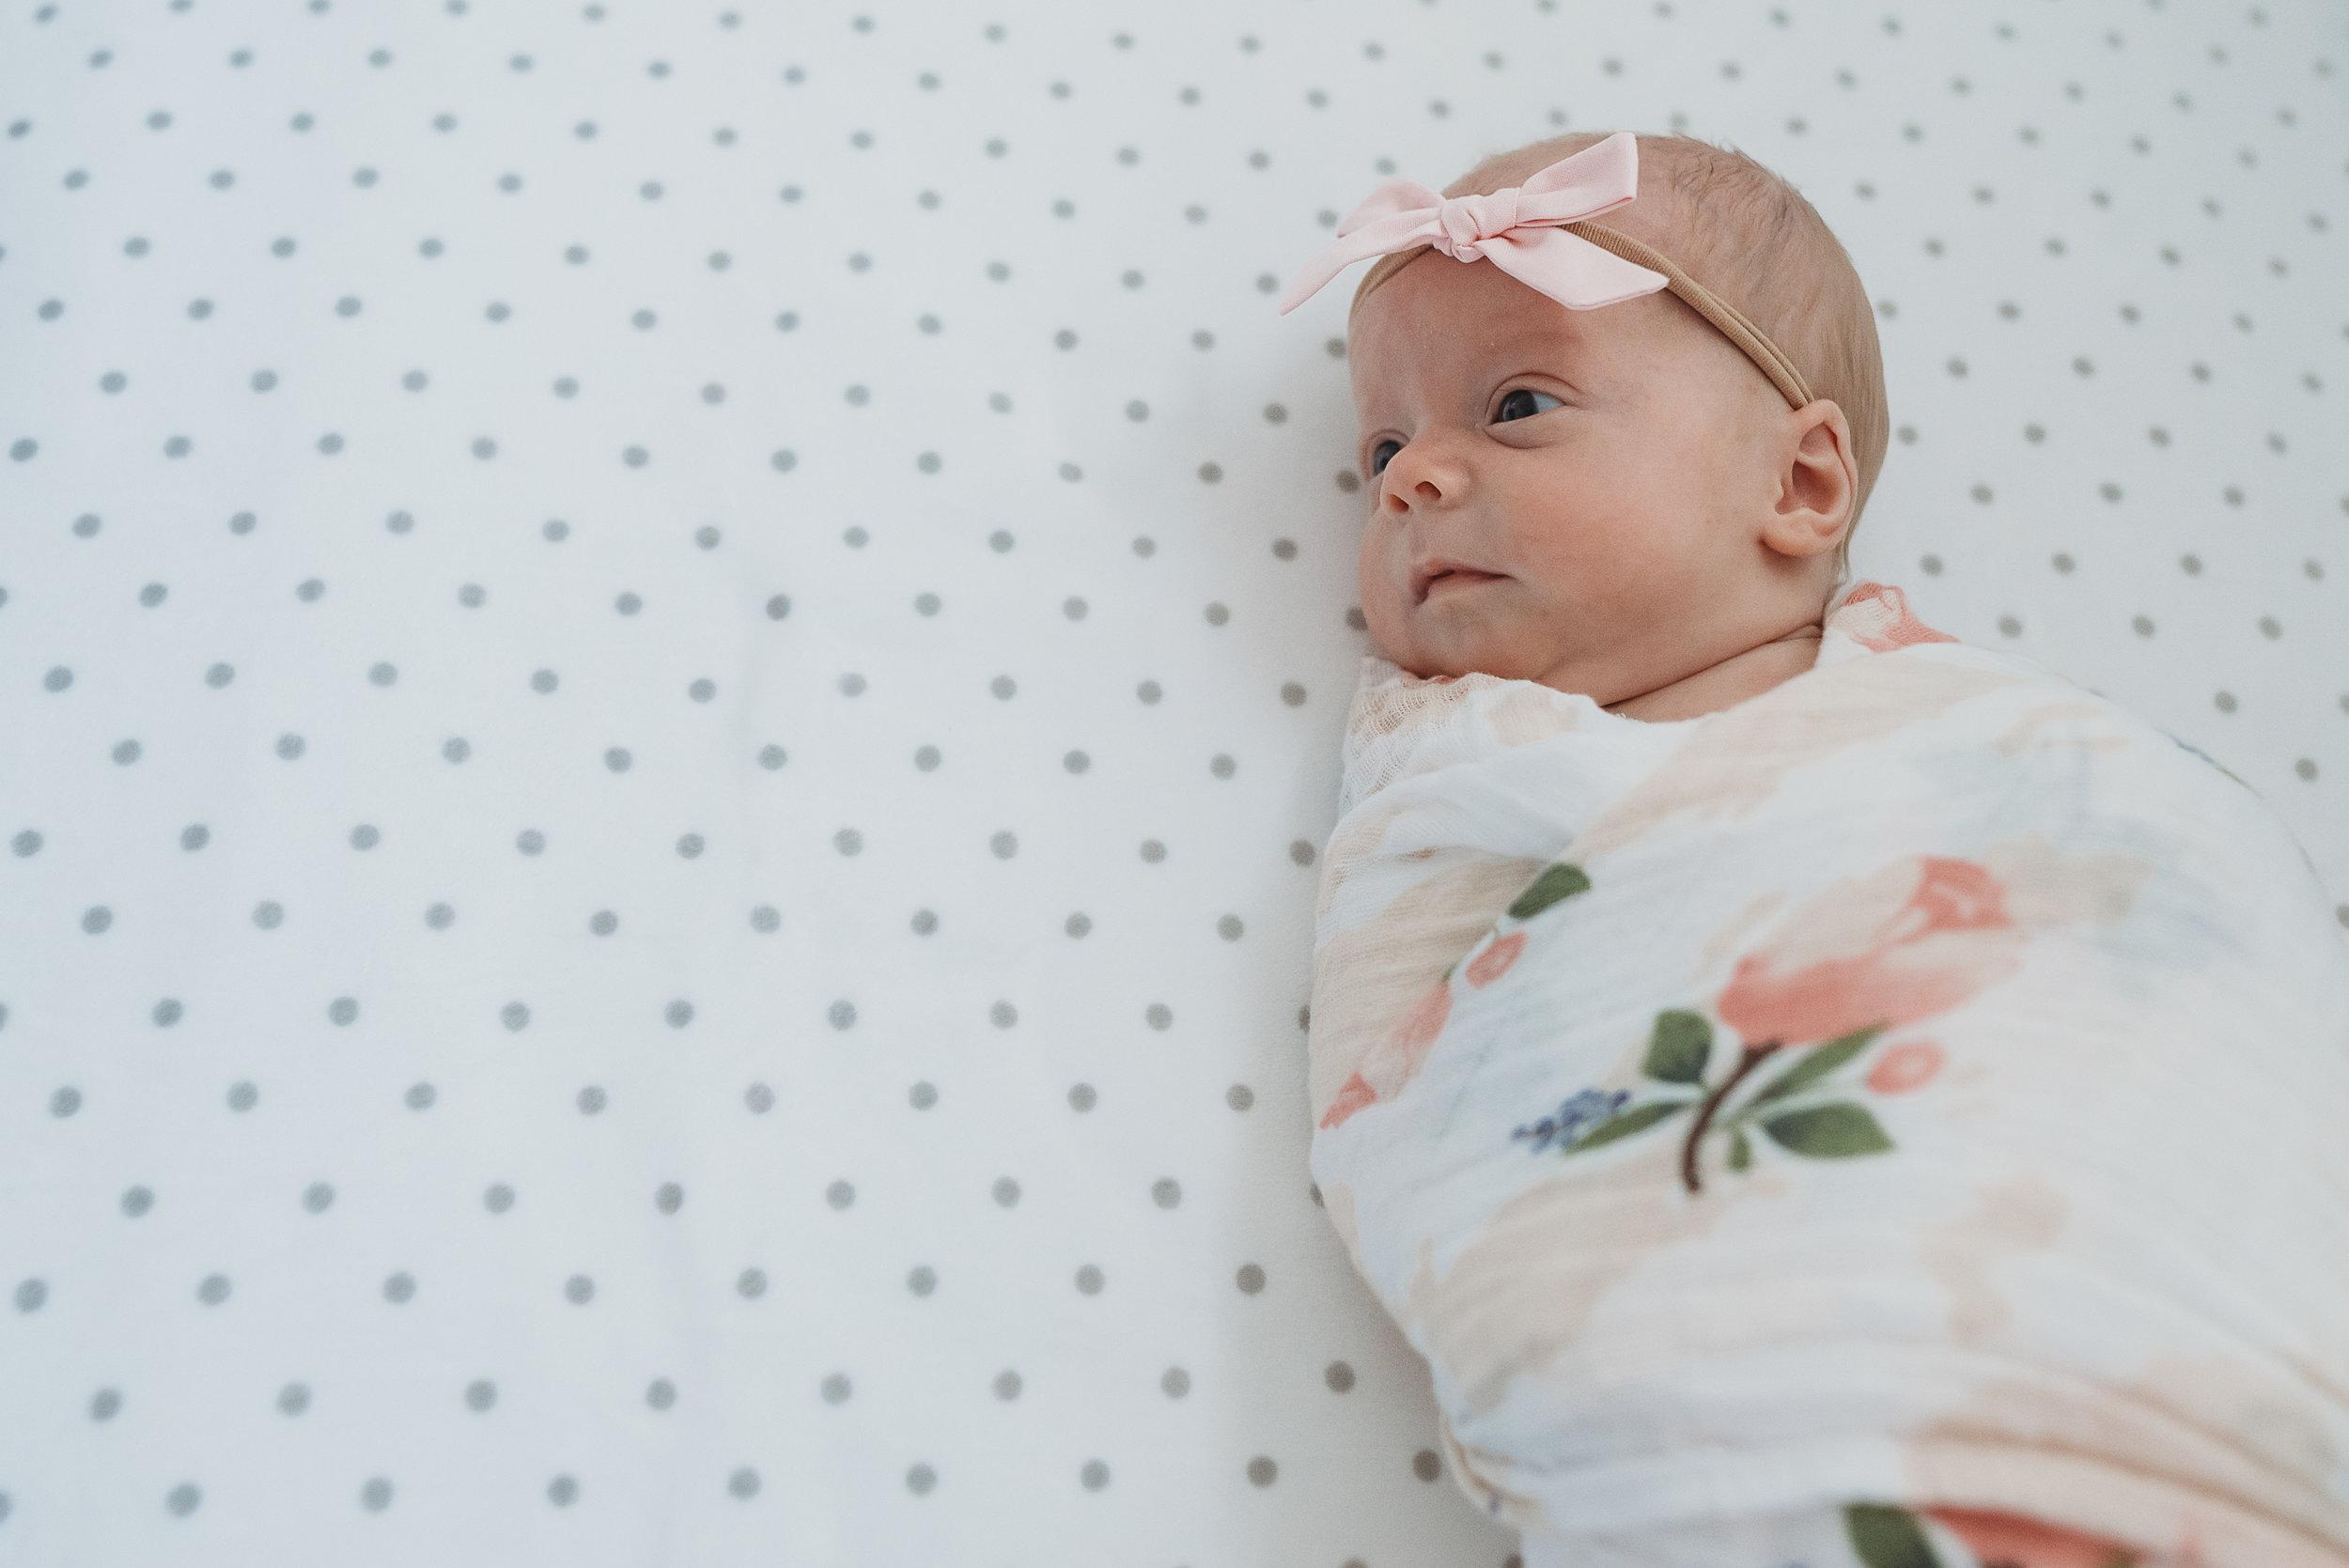 baby girl swaddled in crib